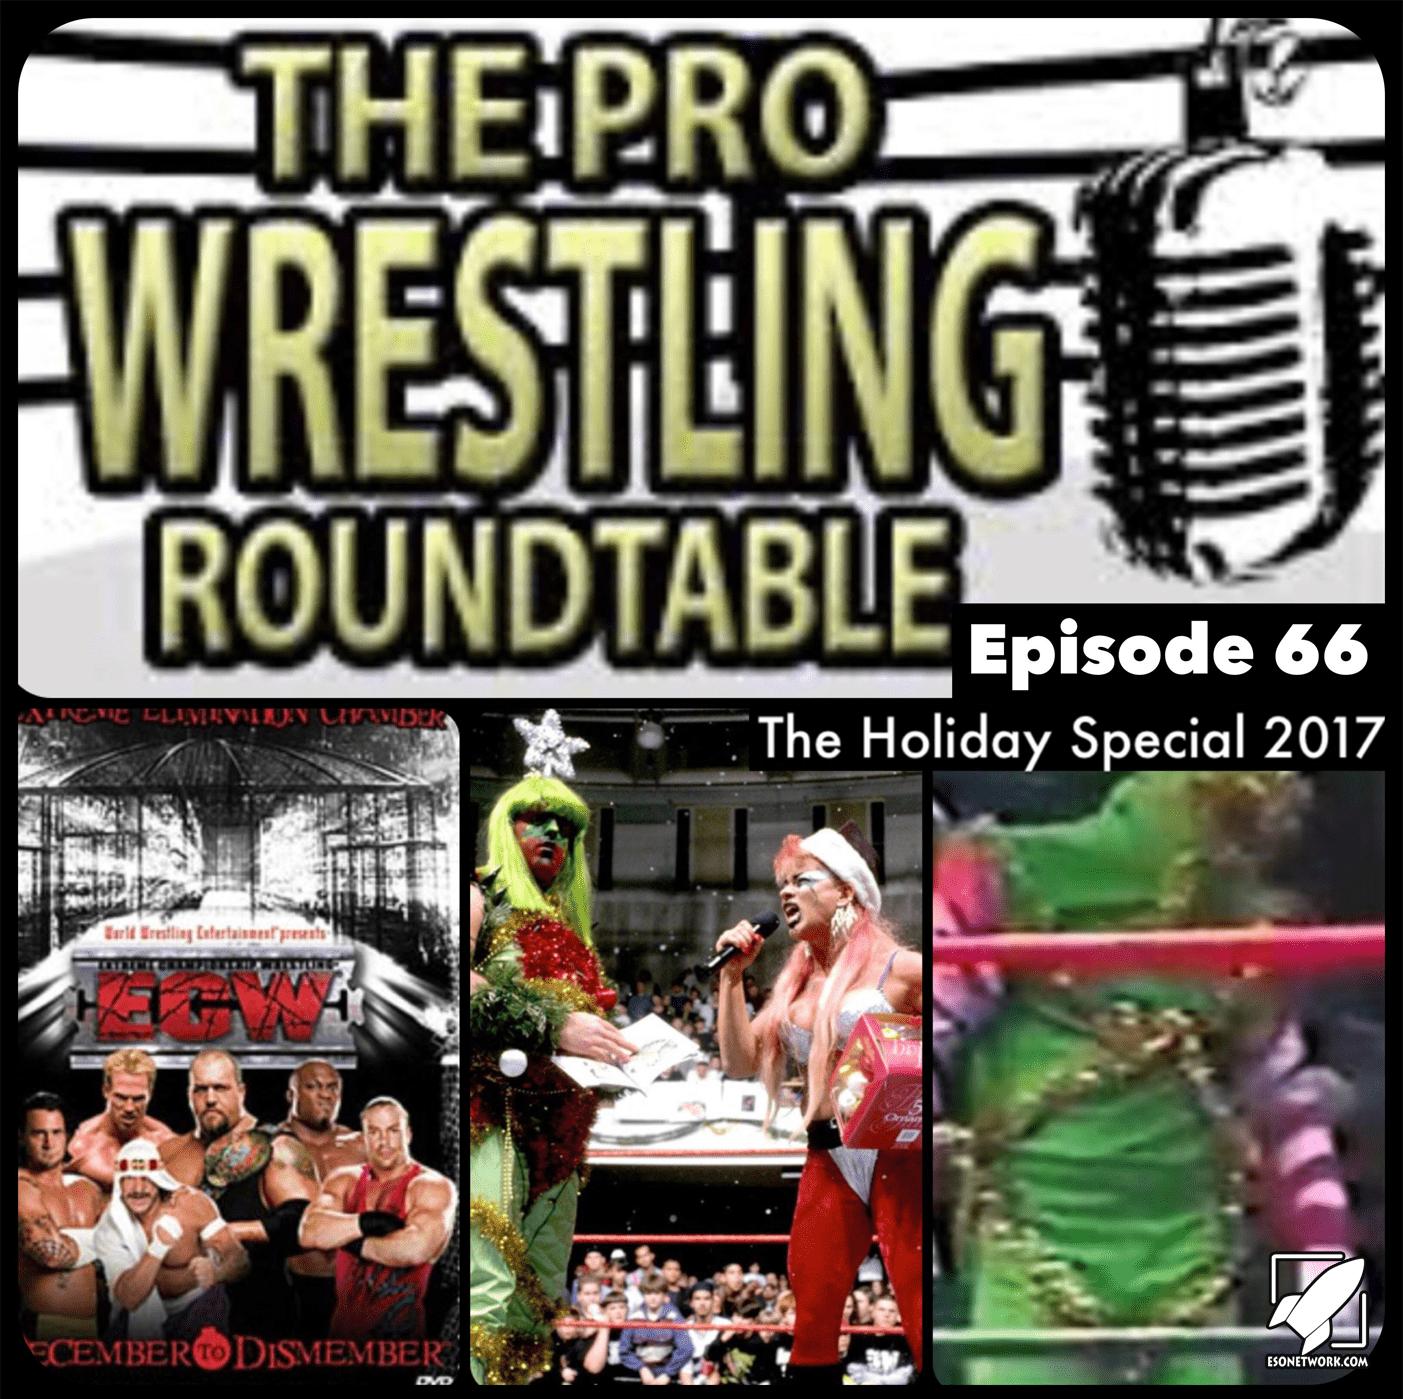 Pro Wrestling Roundtable Ep 66